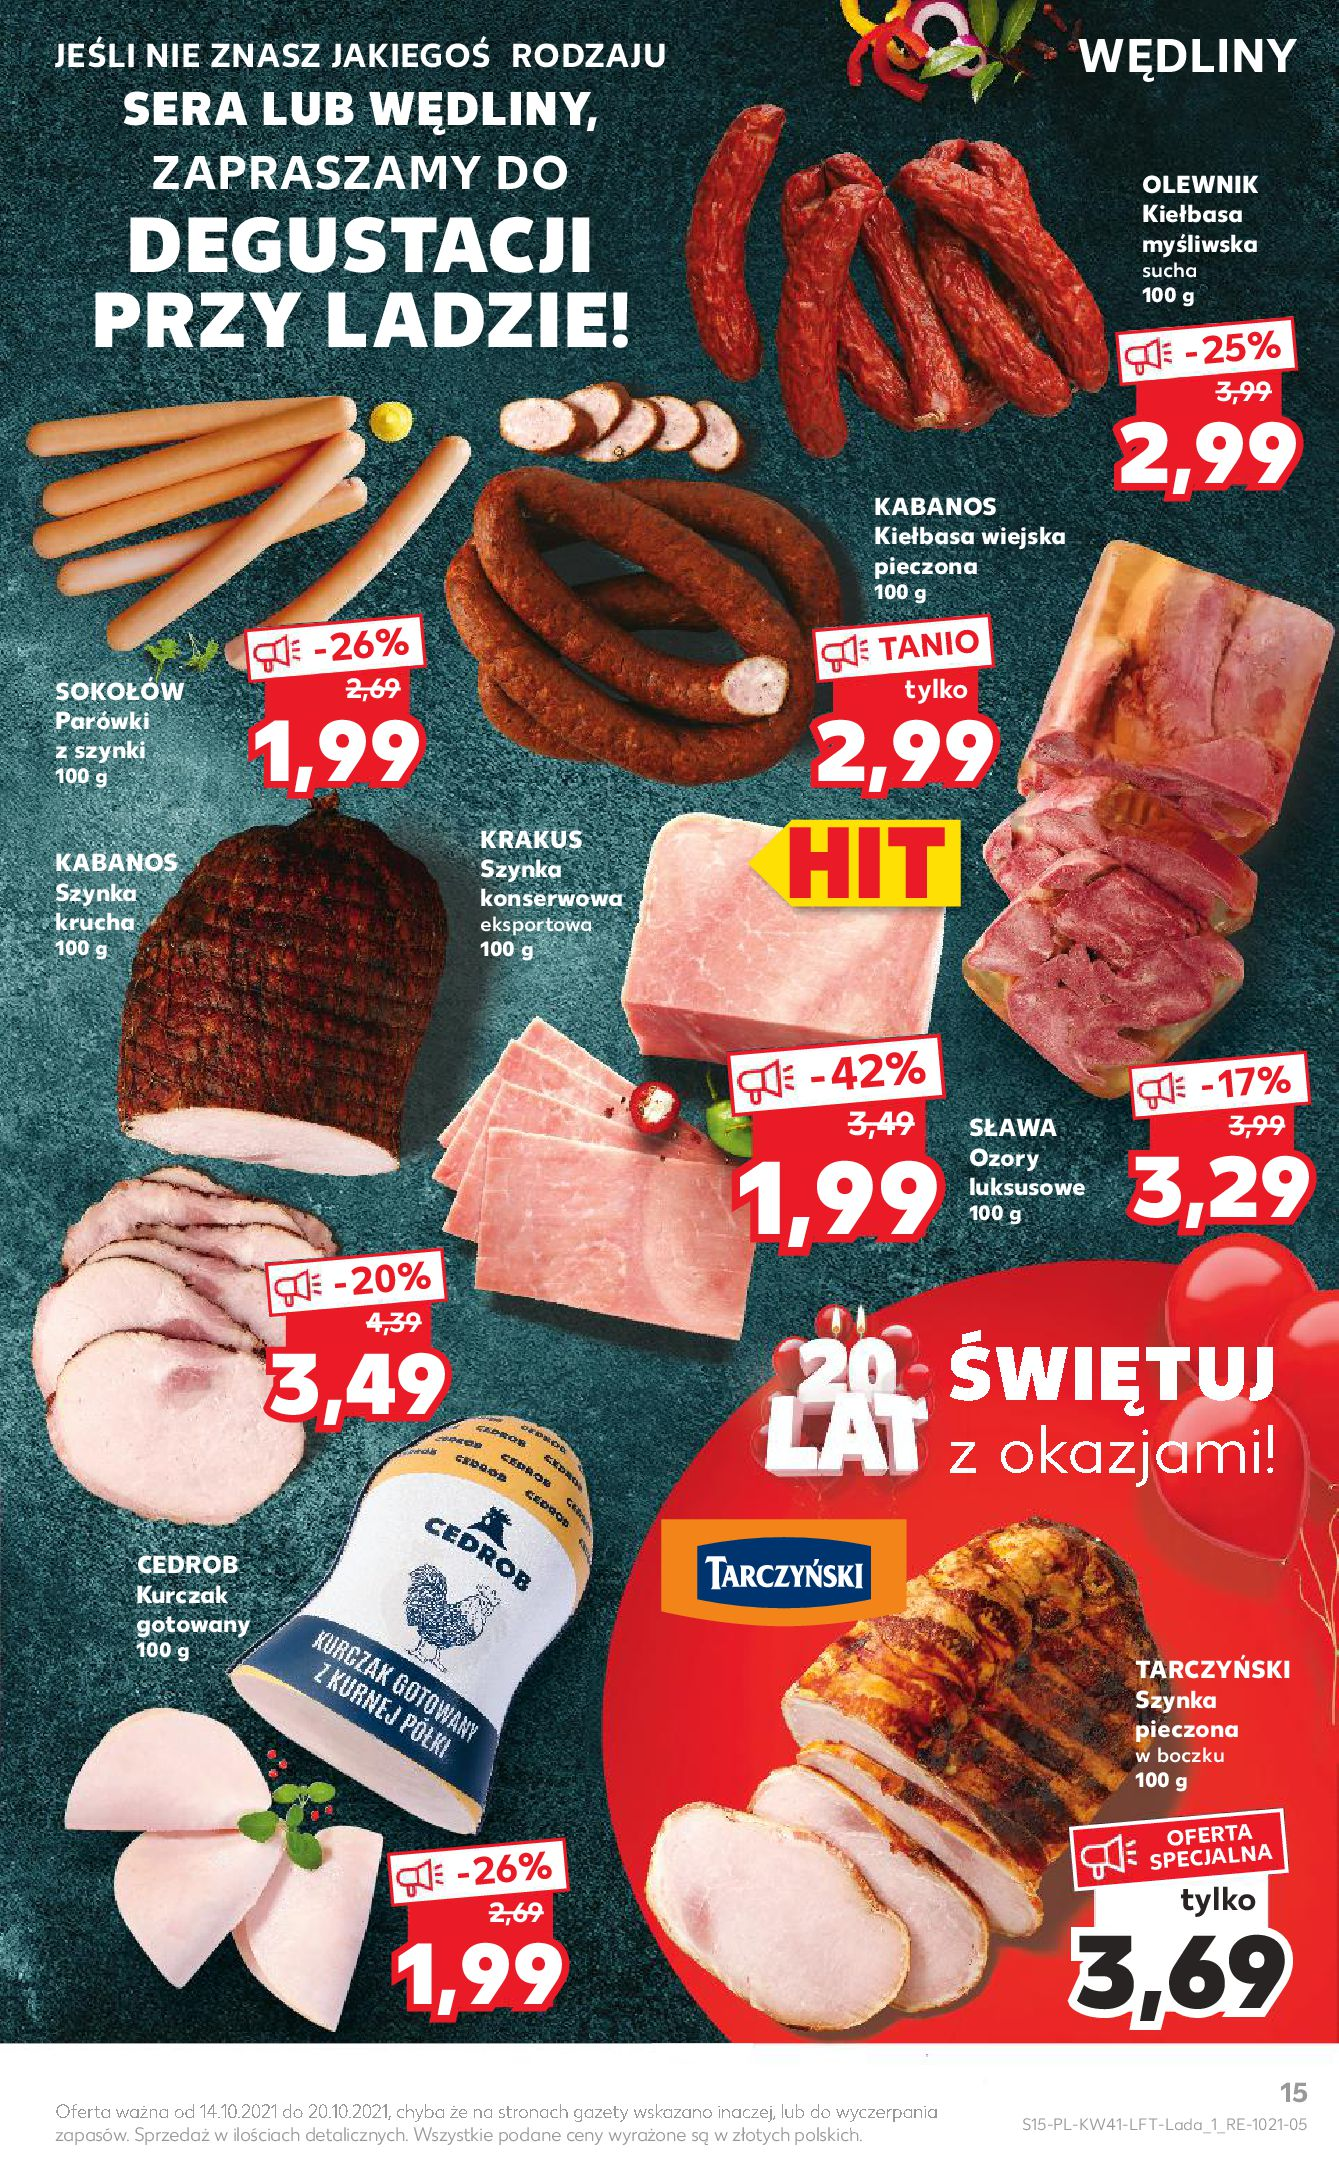 Gazetka Kaufland: Gazetka Kaufland 14-20.10. 2021-10-14 page-15